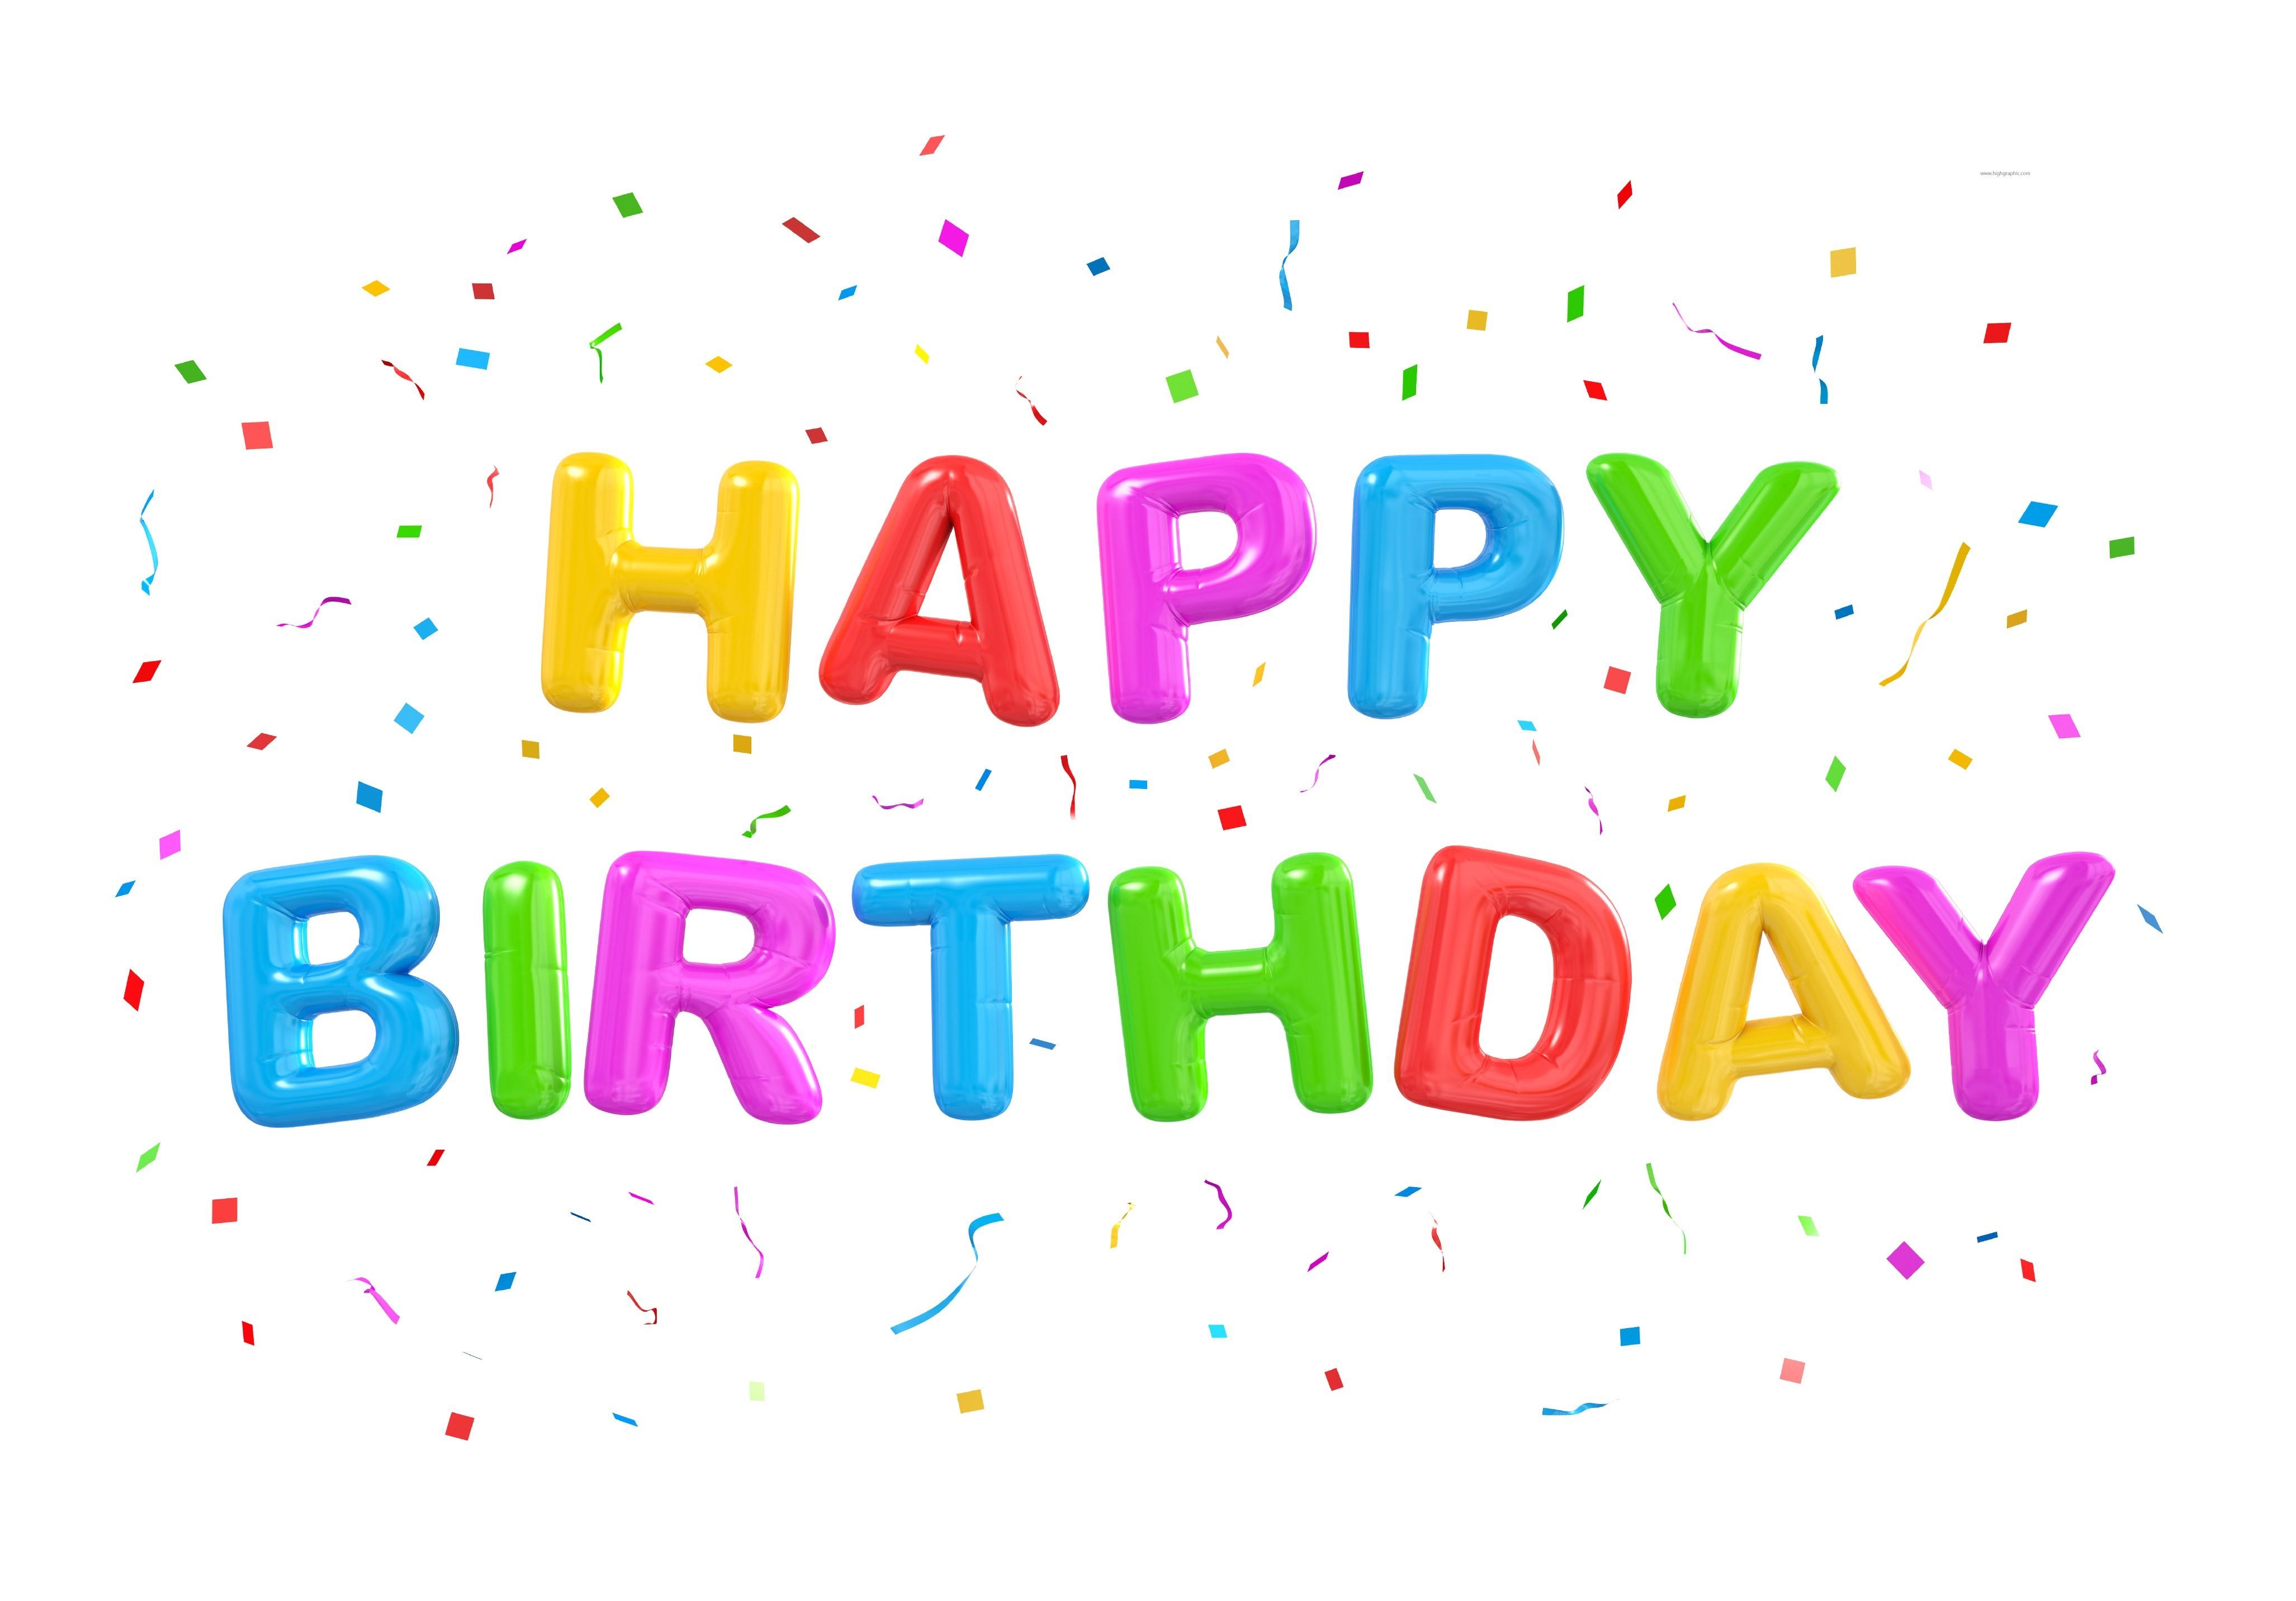 Happy Birthday Imagesarielle fic 4107x2863